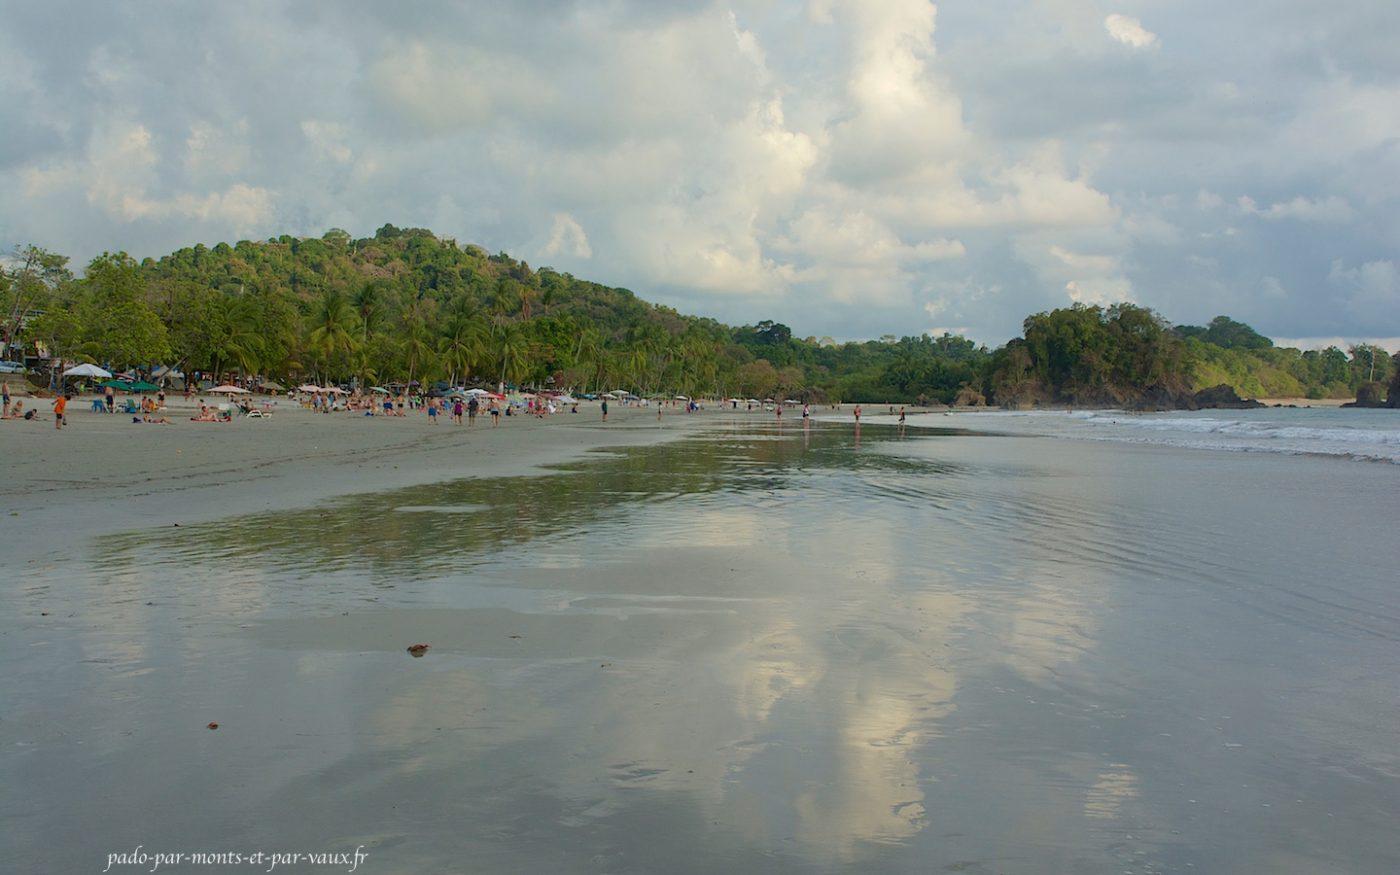 Playa Espadilla